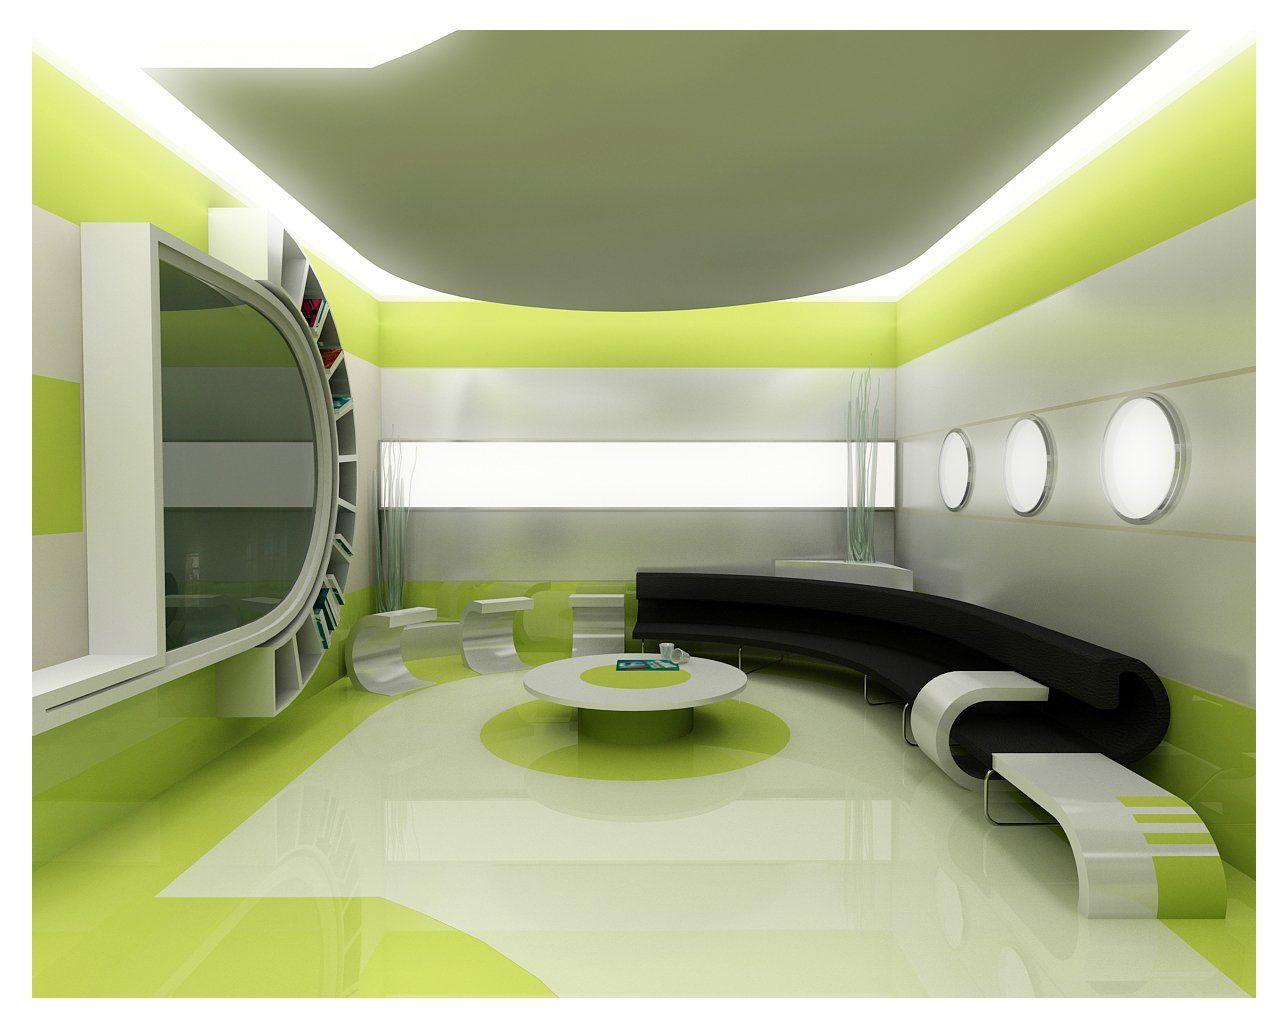 designer house interior | house designs